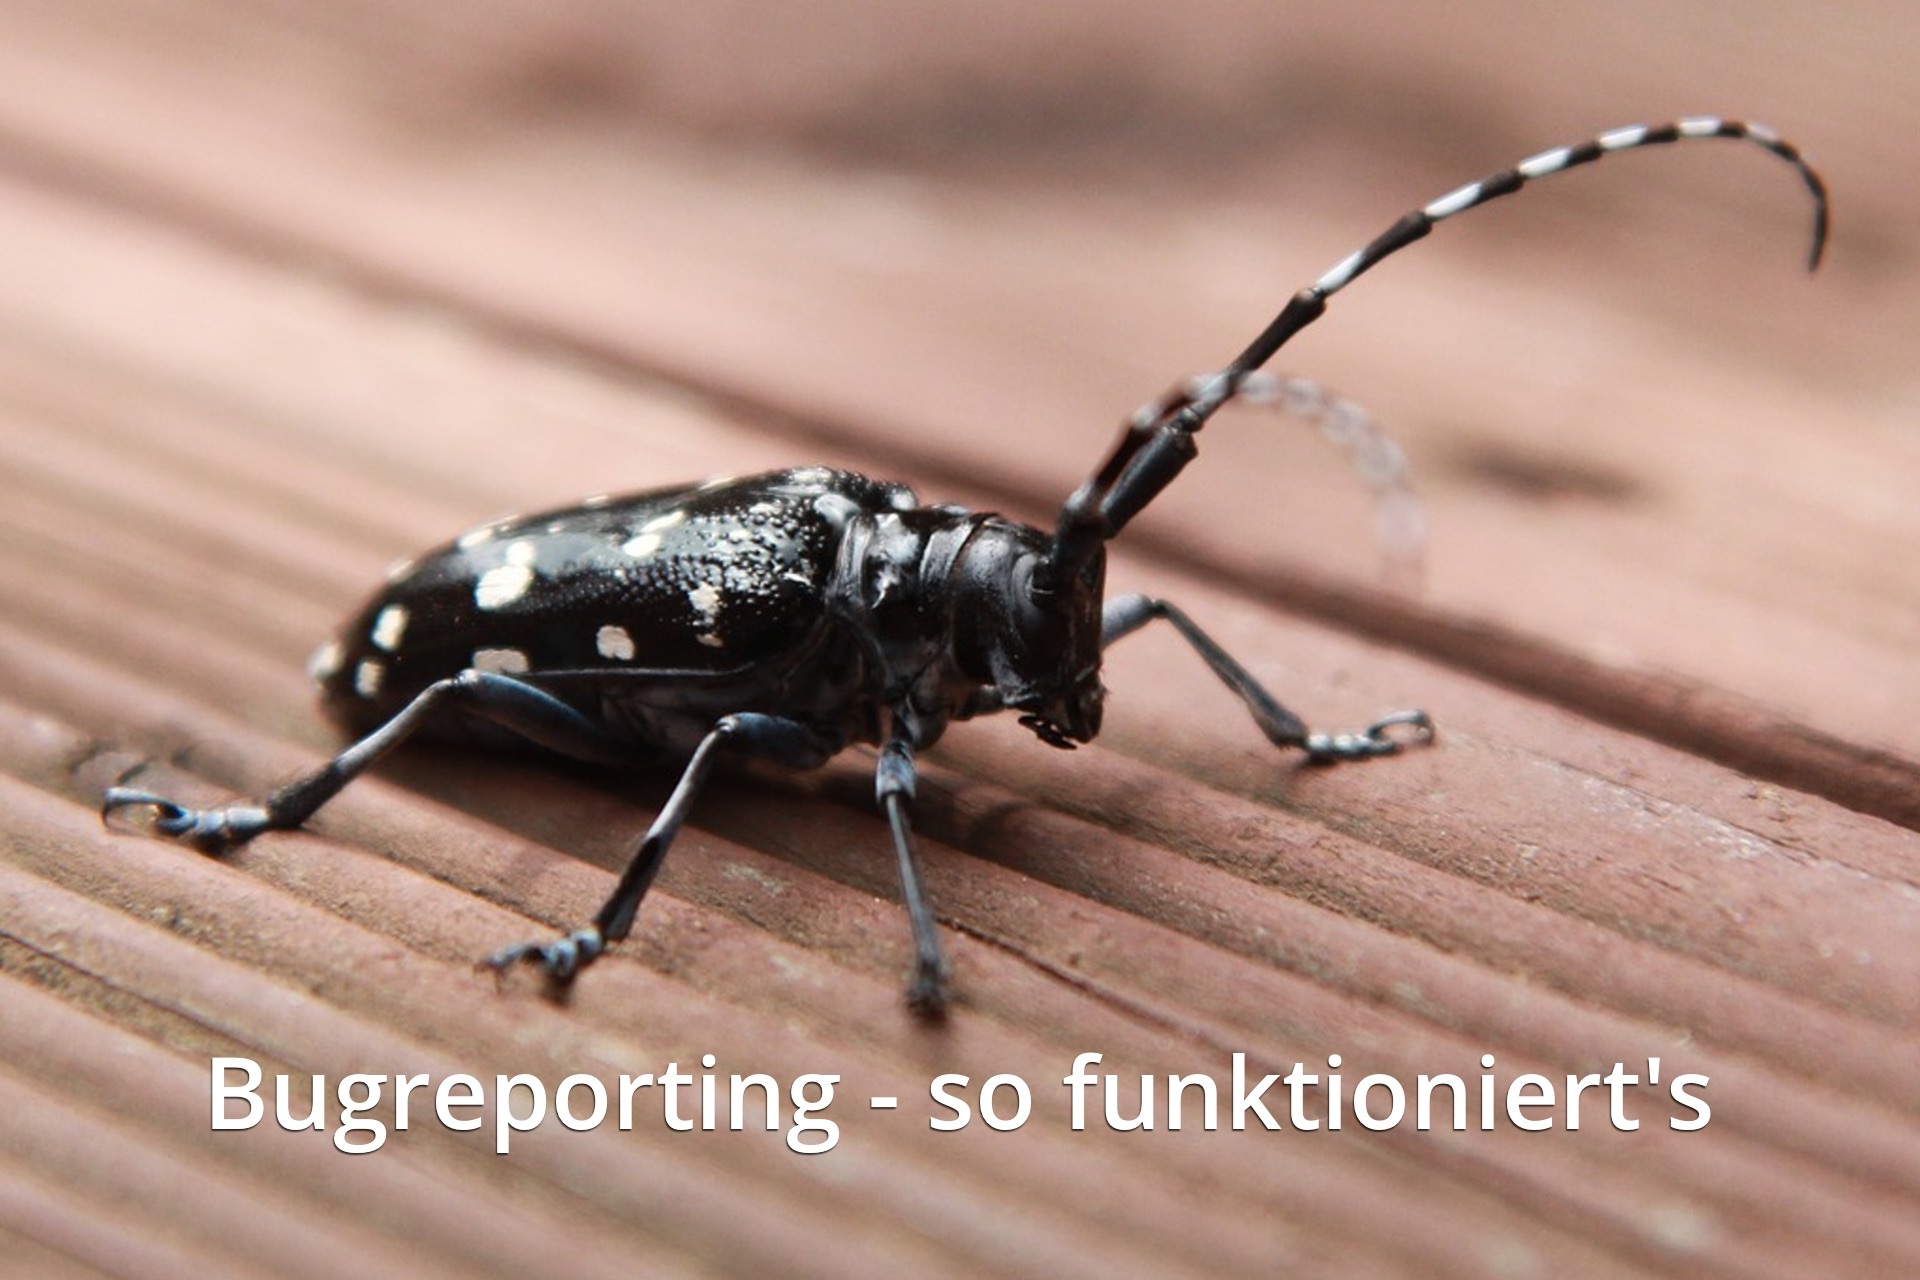 bugreporting